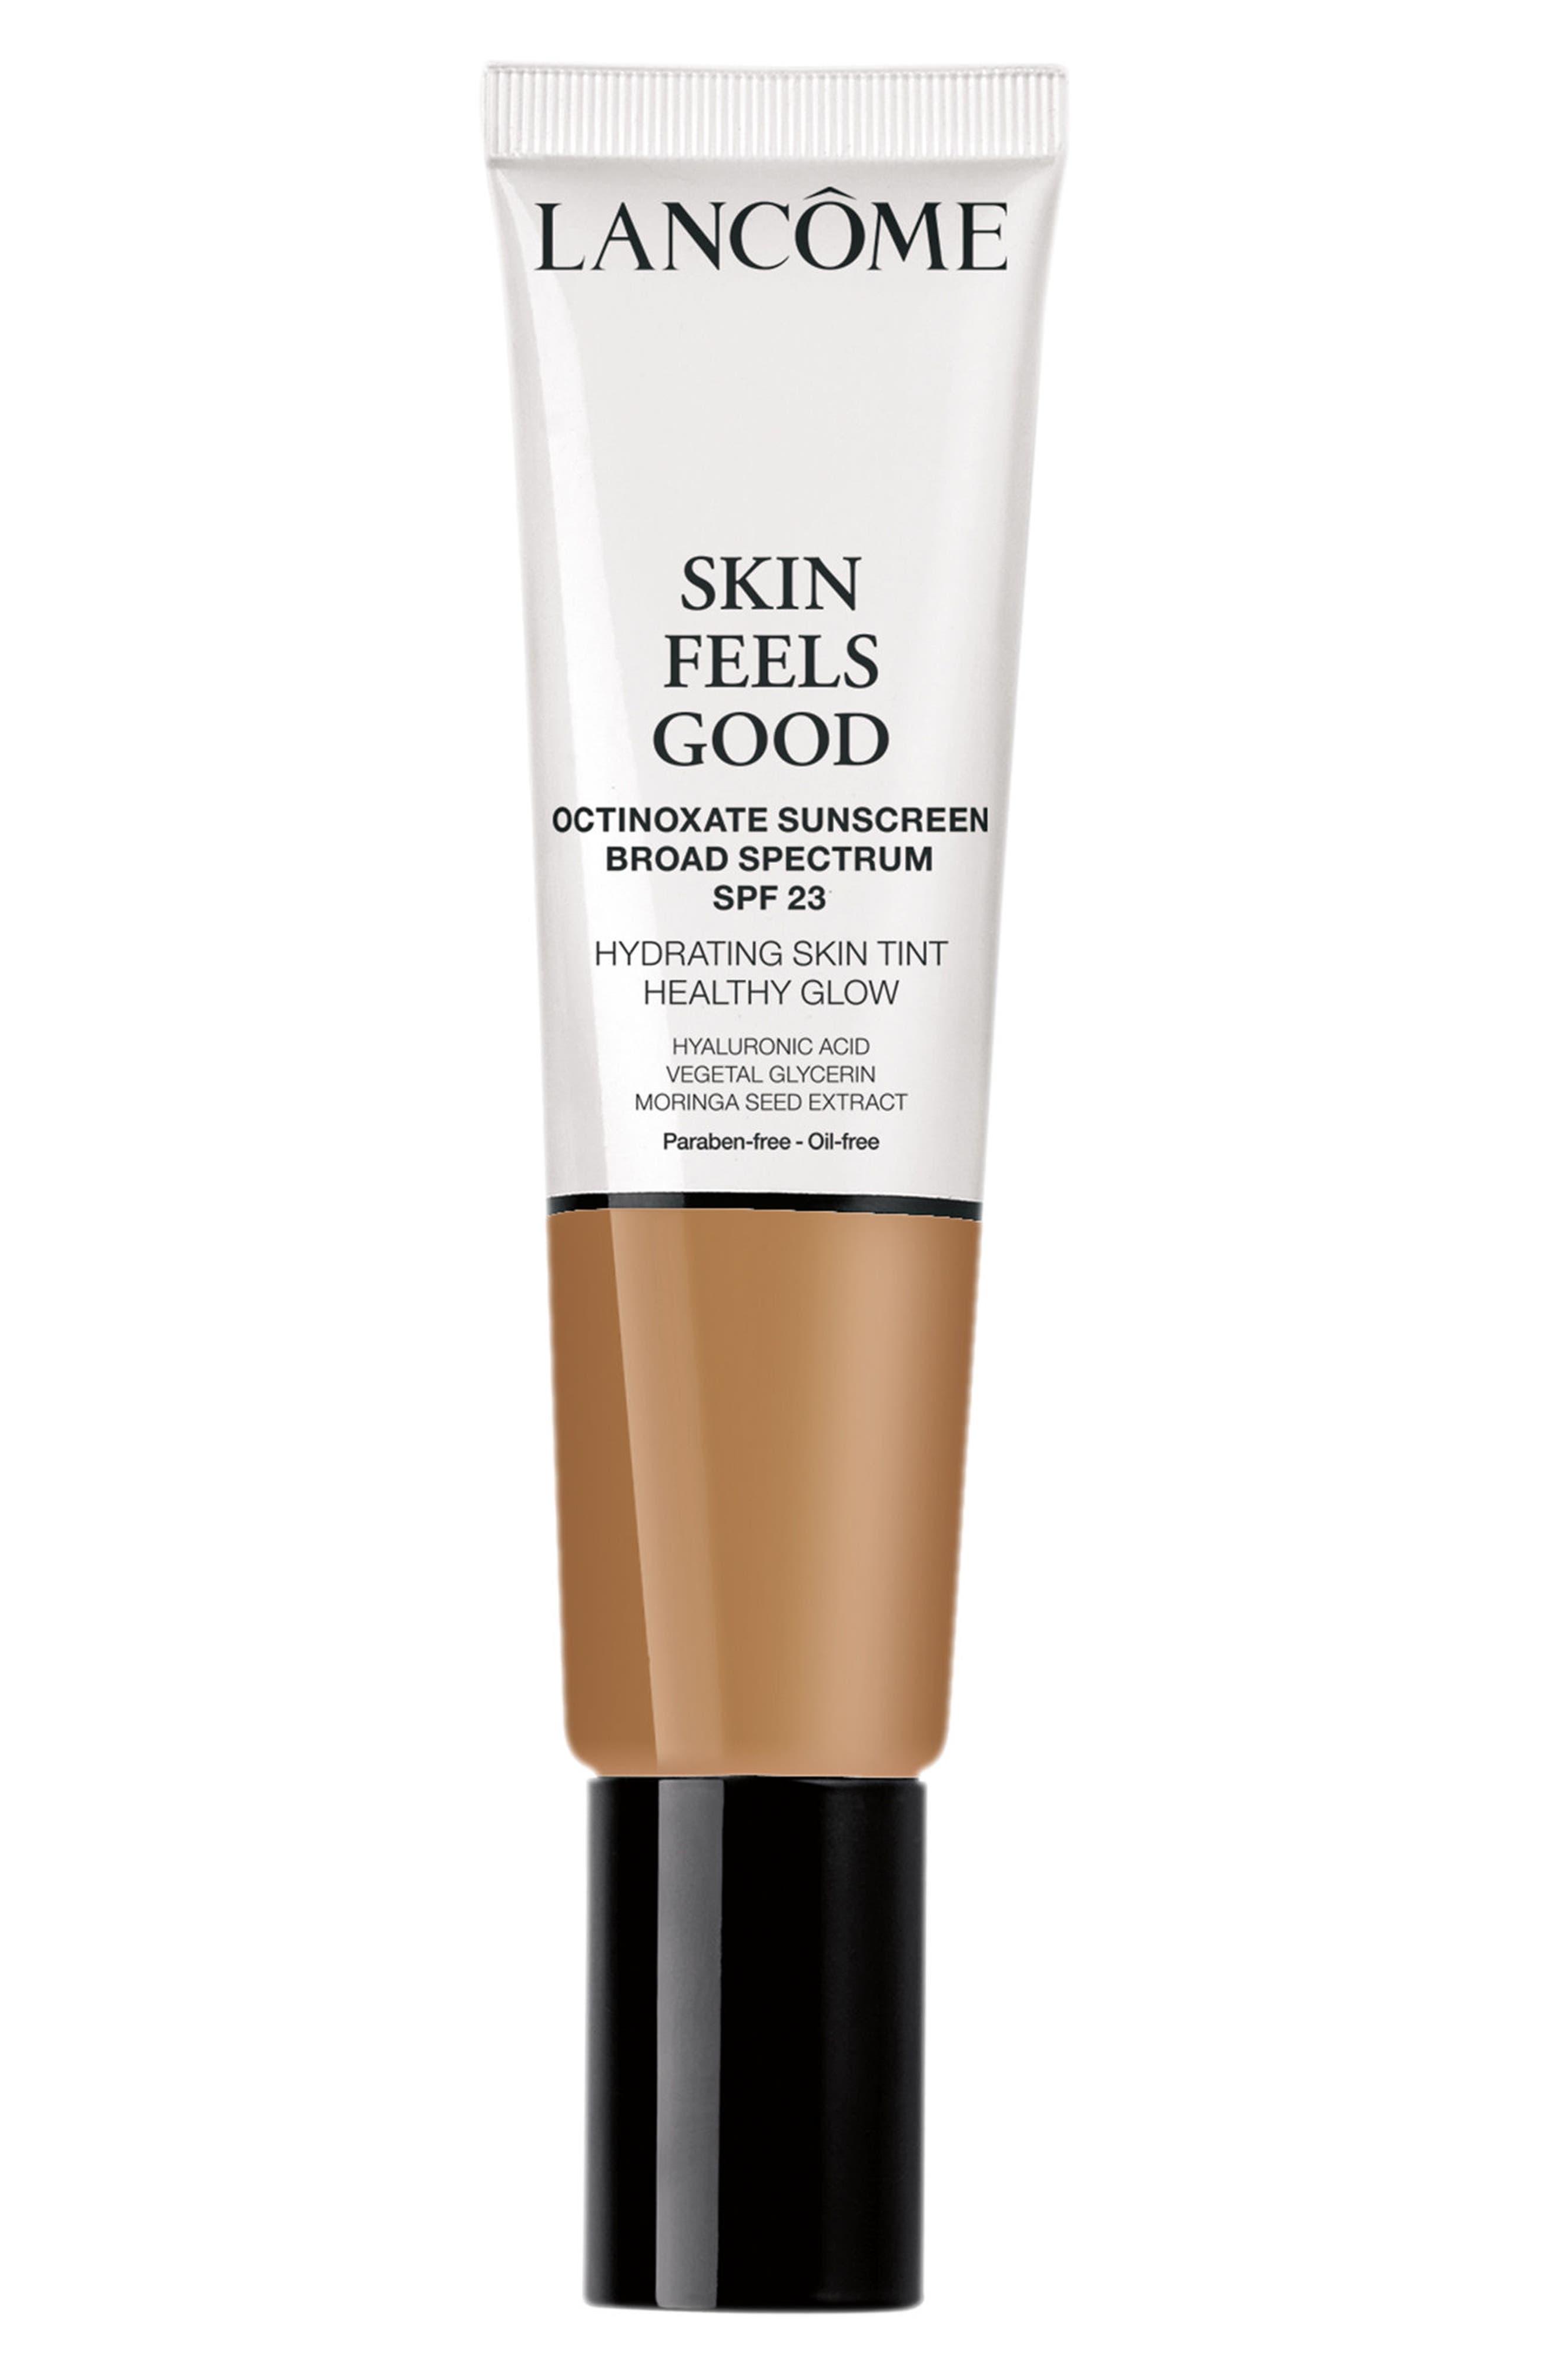 Skin Feels Good Hydrating Skin Tint Healthy Glow SPF 23,                         Main,                         color, 08N SWEET HONEY